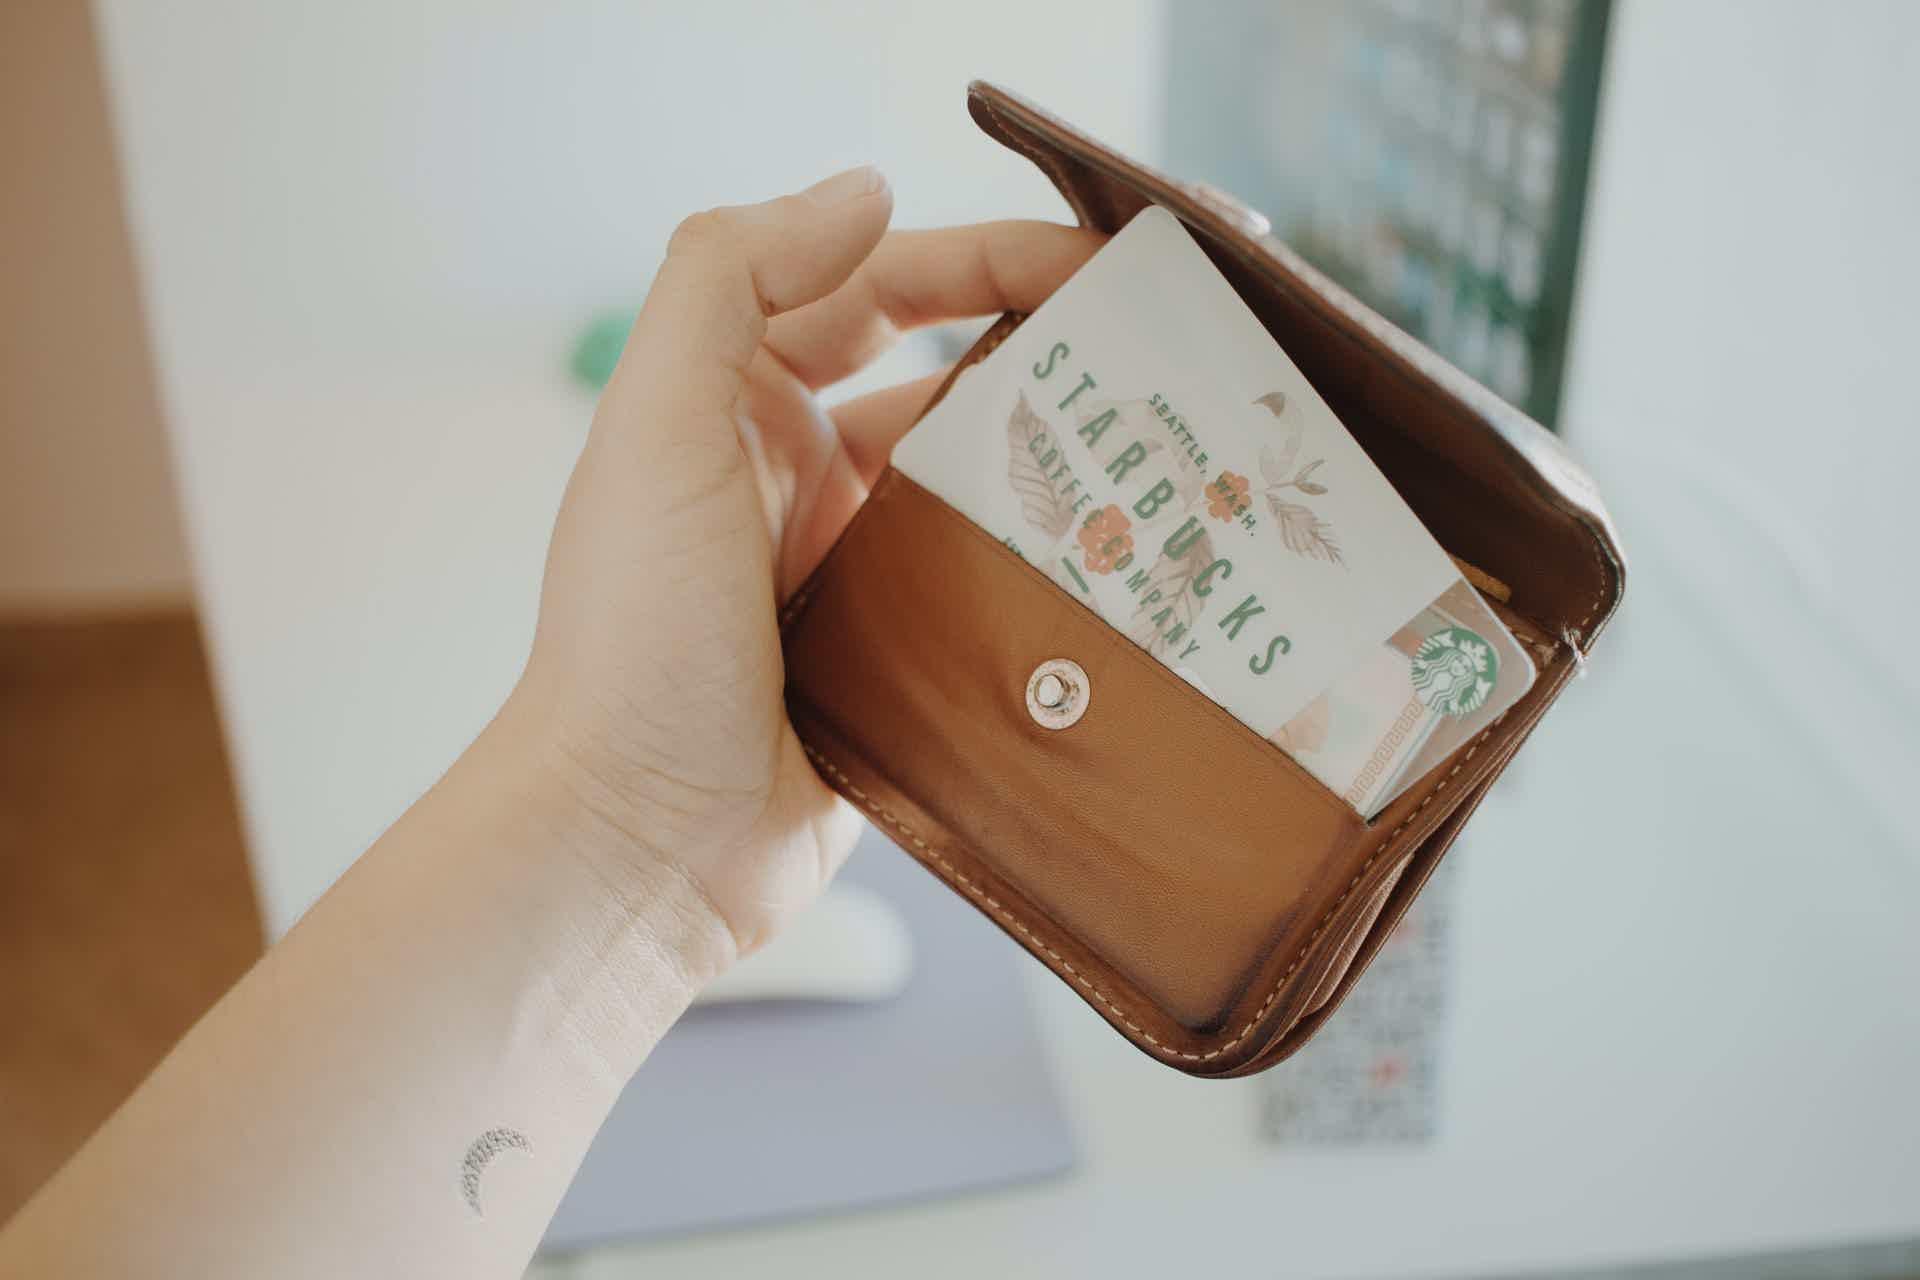 Starbucks Rewards Unsplash